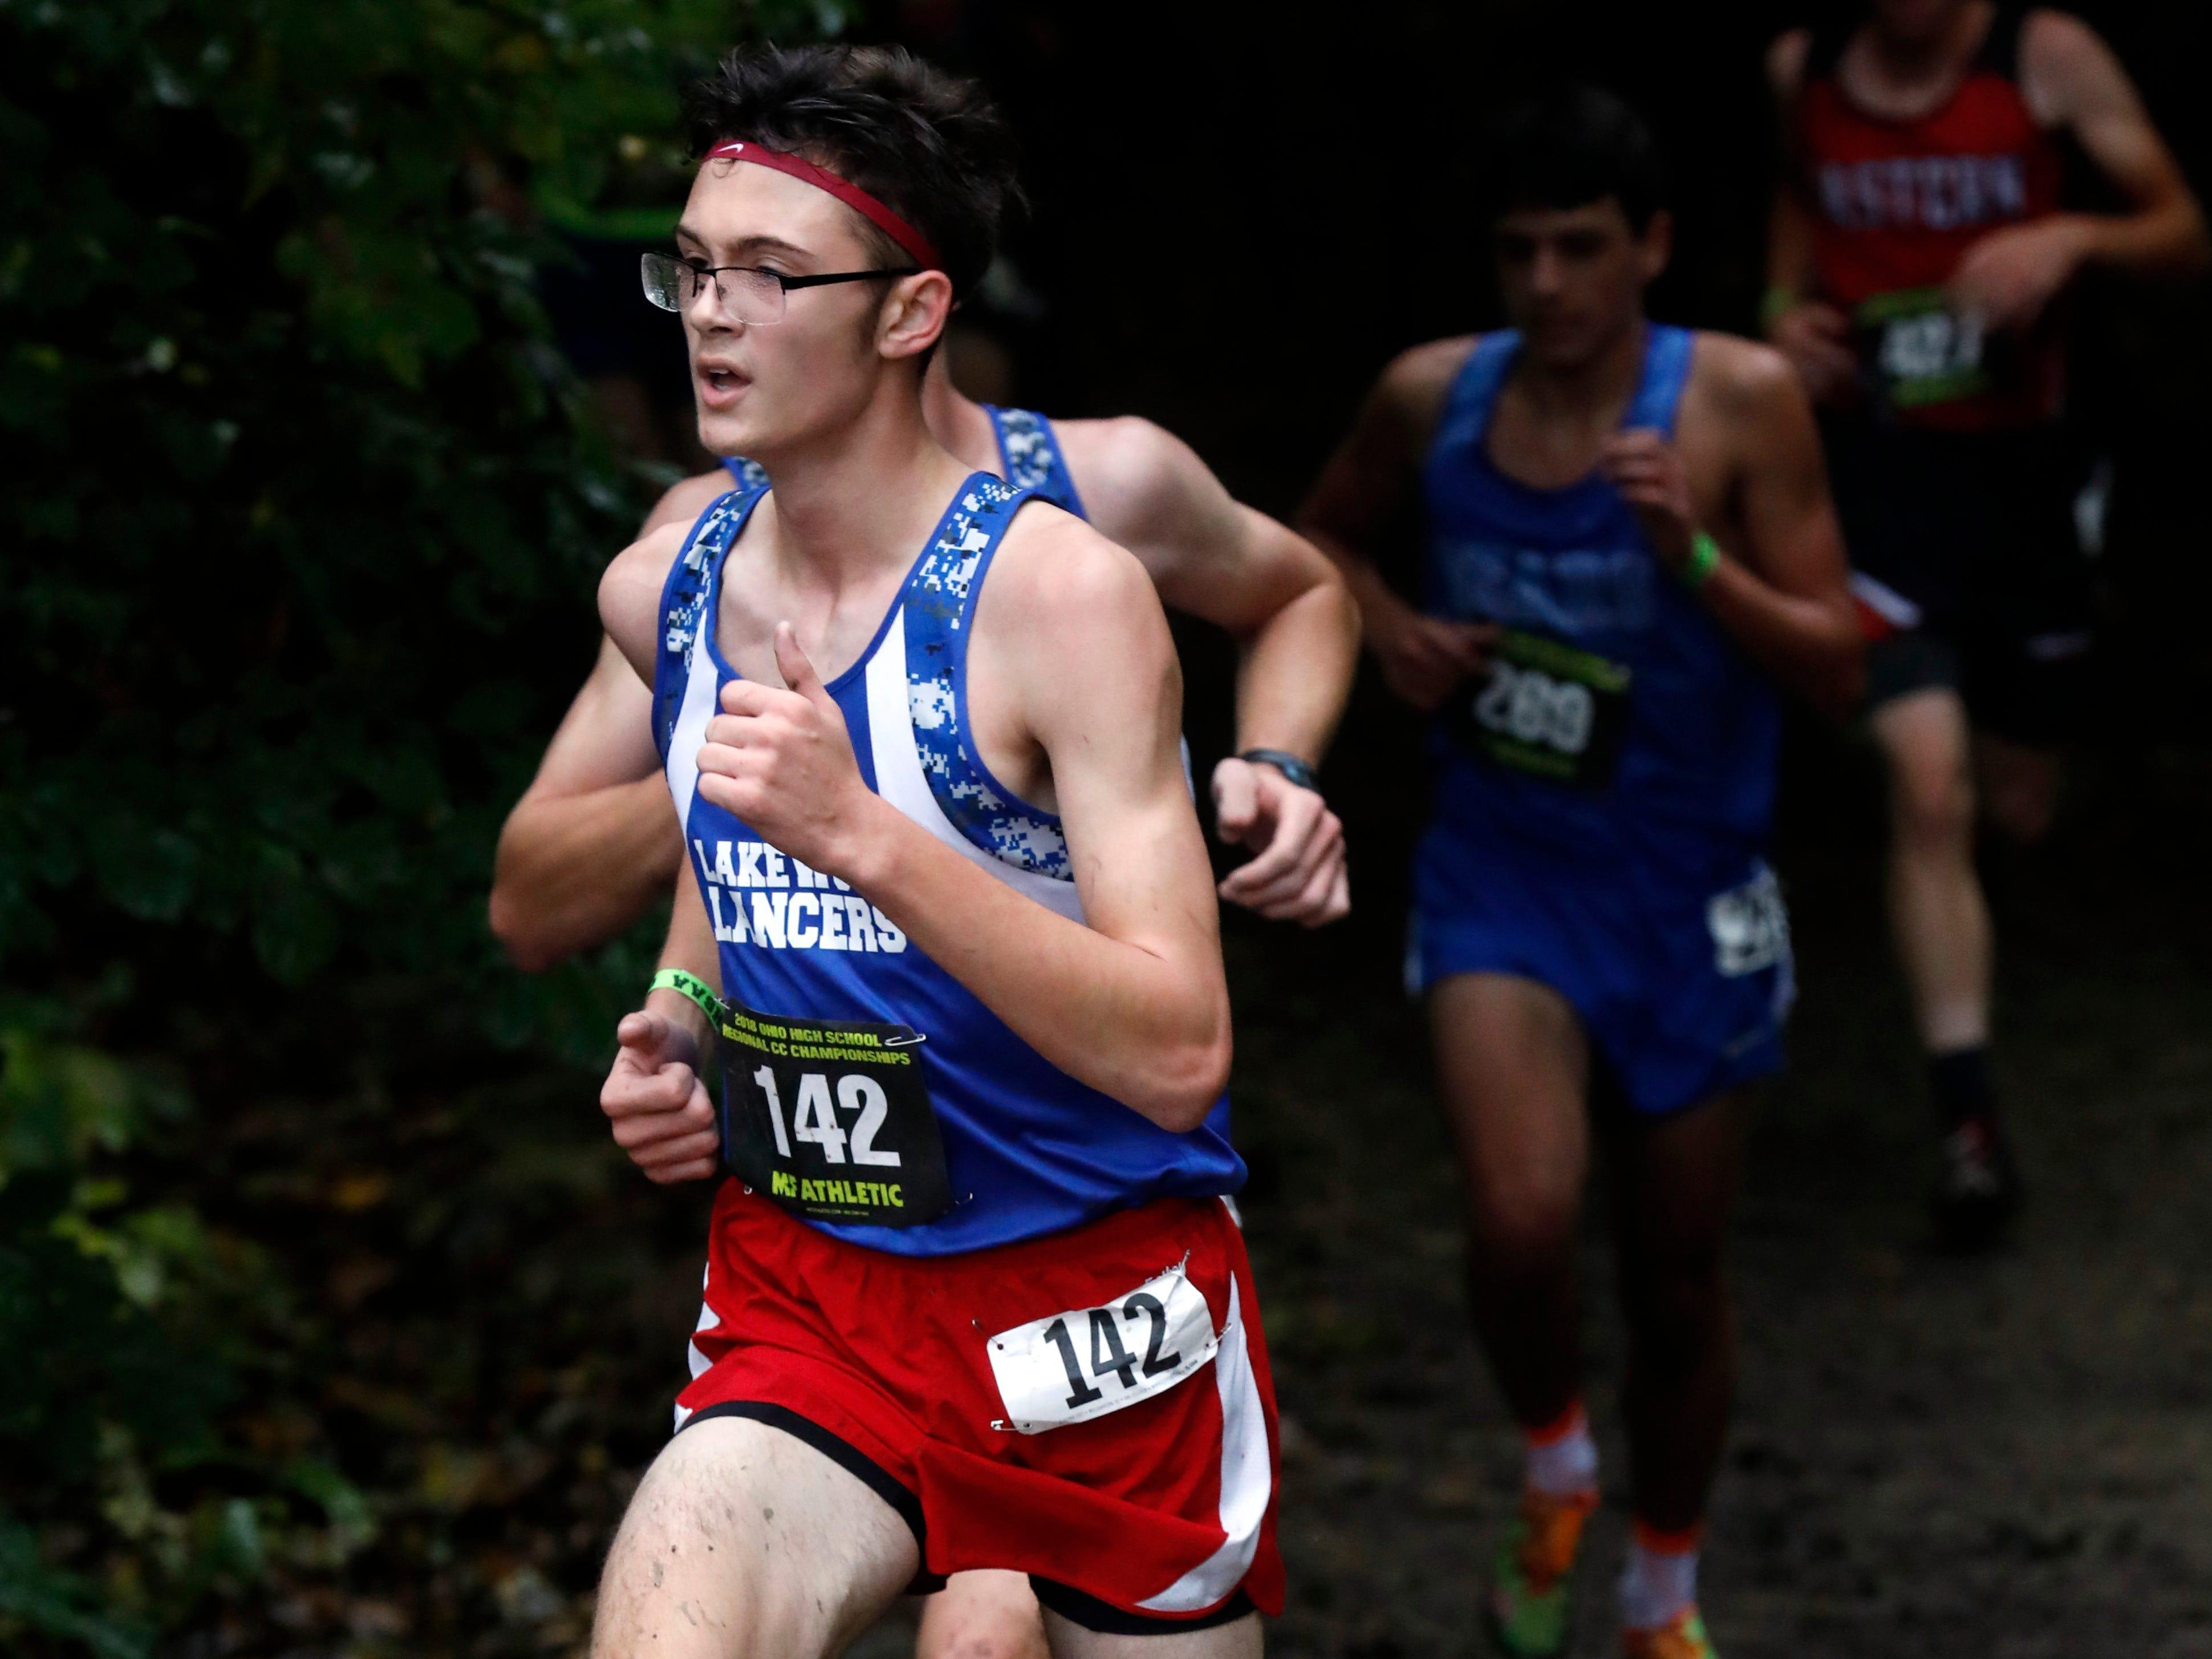 Lakewood's Jonathon Holbrook runs in the Regional Cross Country meet Saturday, Oct. 27, 2018, at Pickerington North High School in Pickerington.